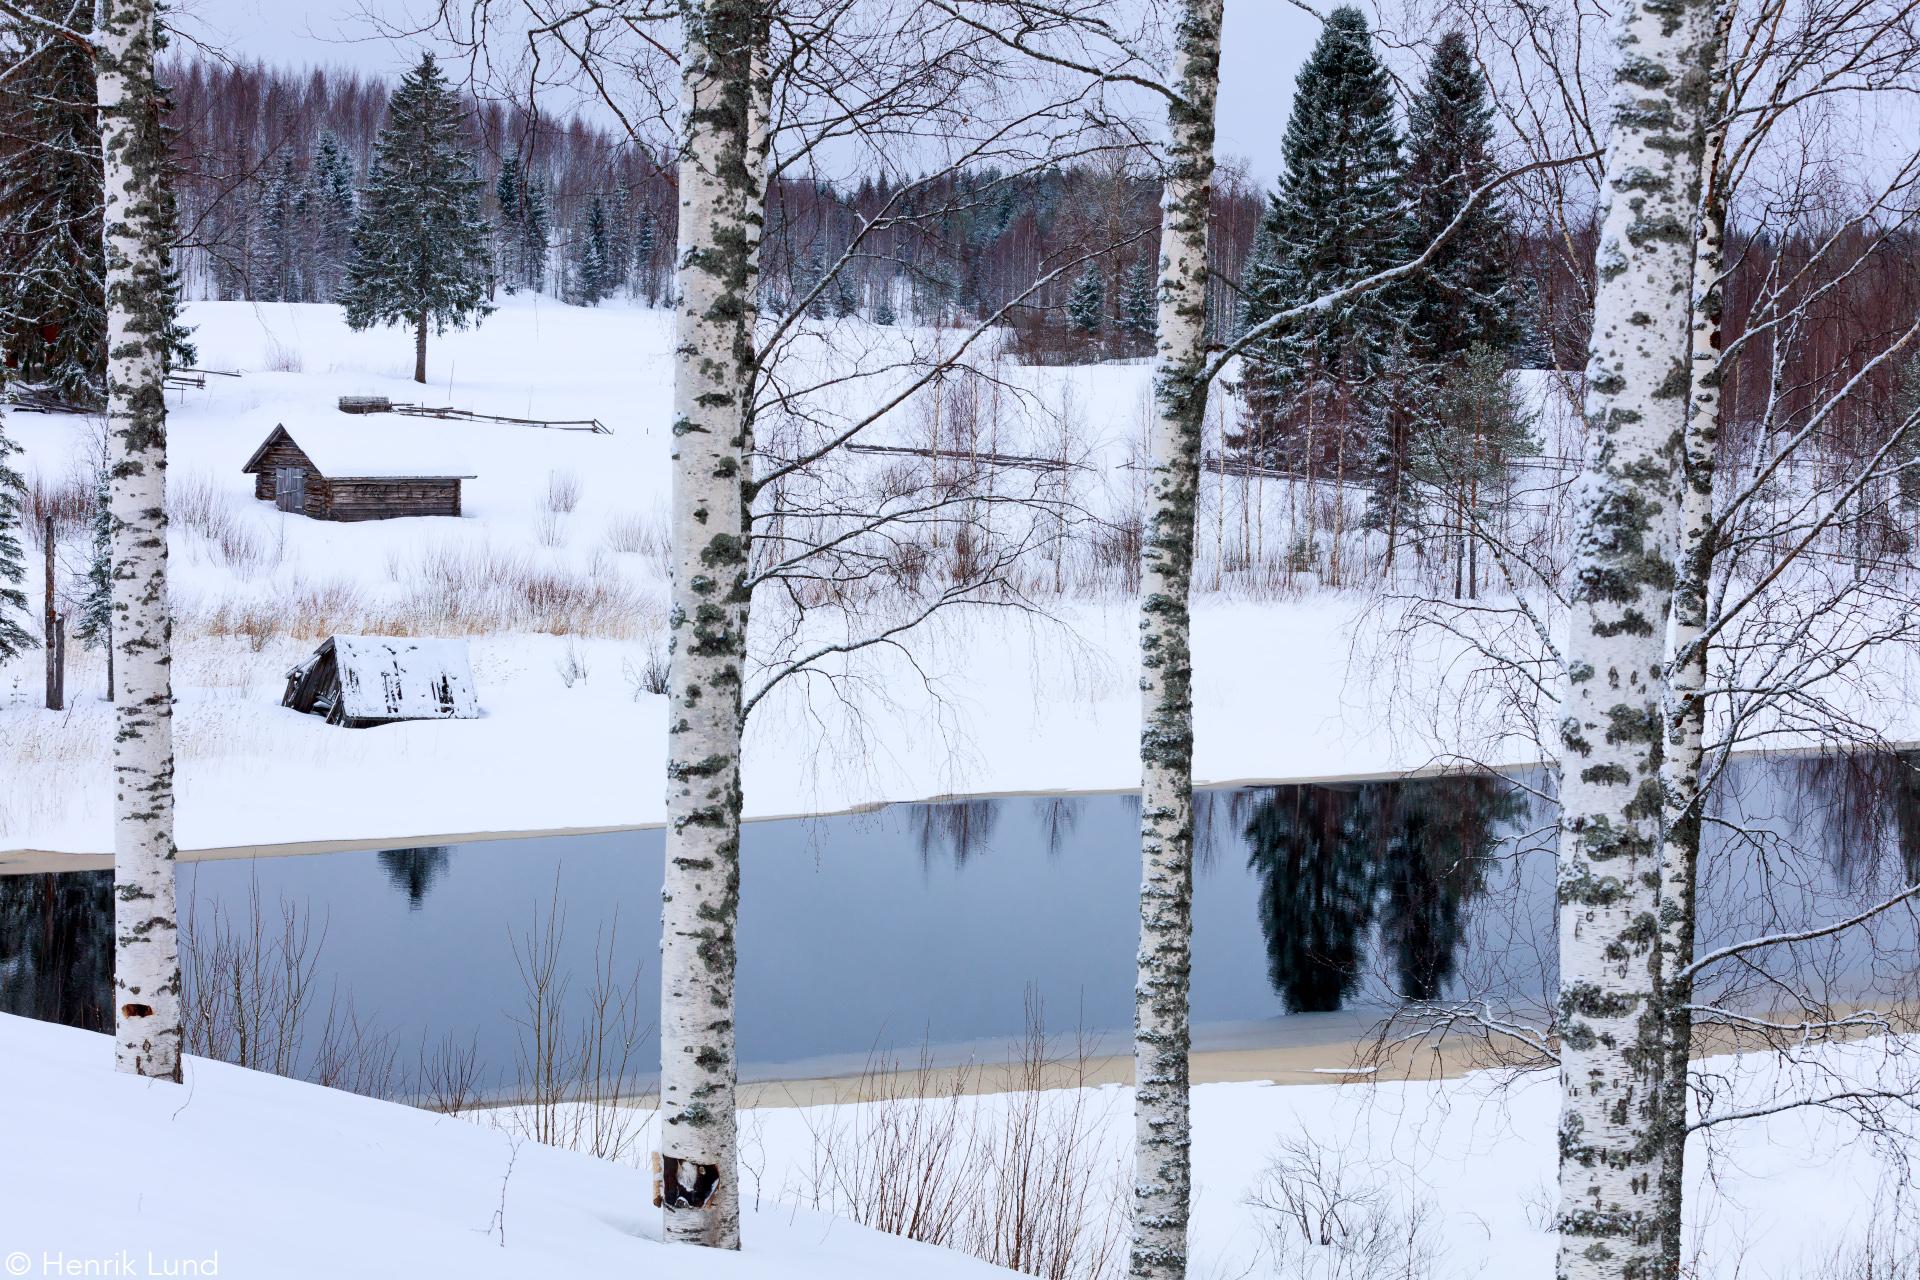 View over Onnenvirta in Hoilola, Tuupovaara, Joensuu, Finland. February 2017.